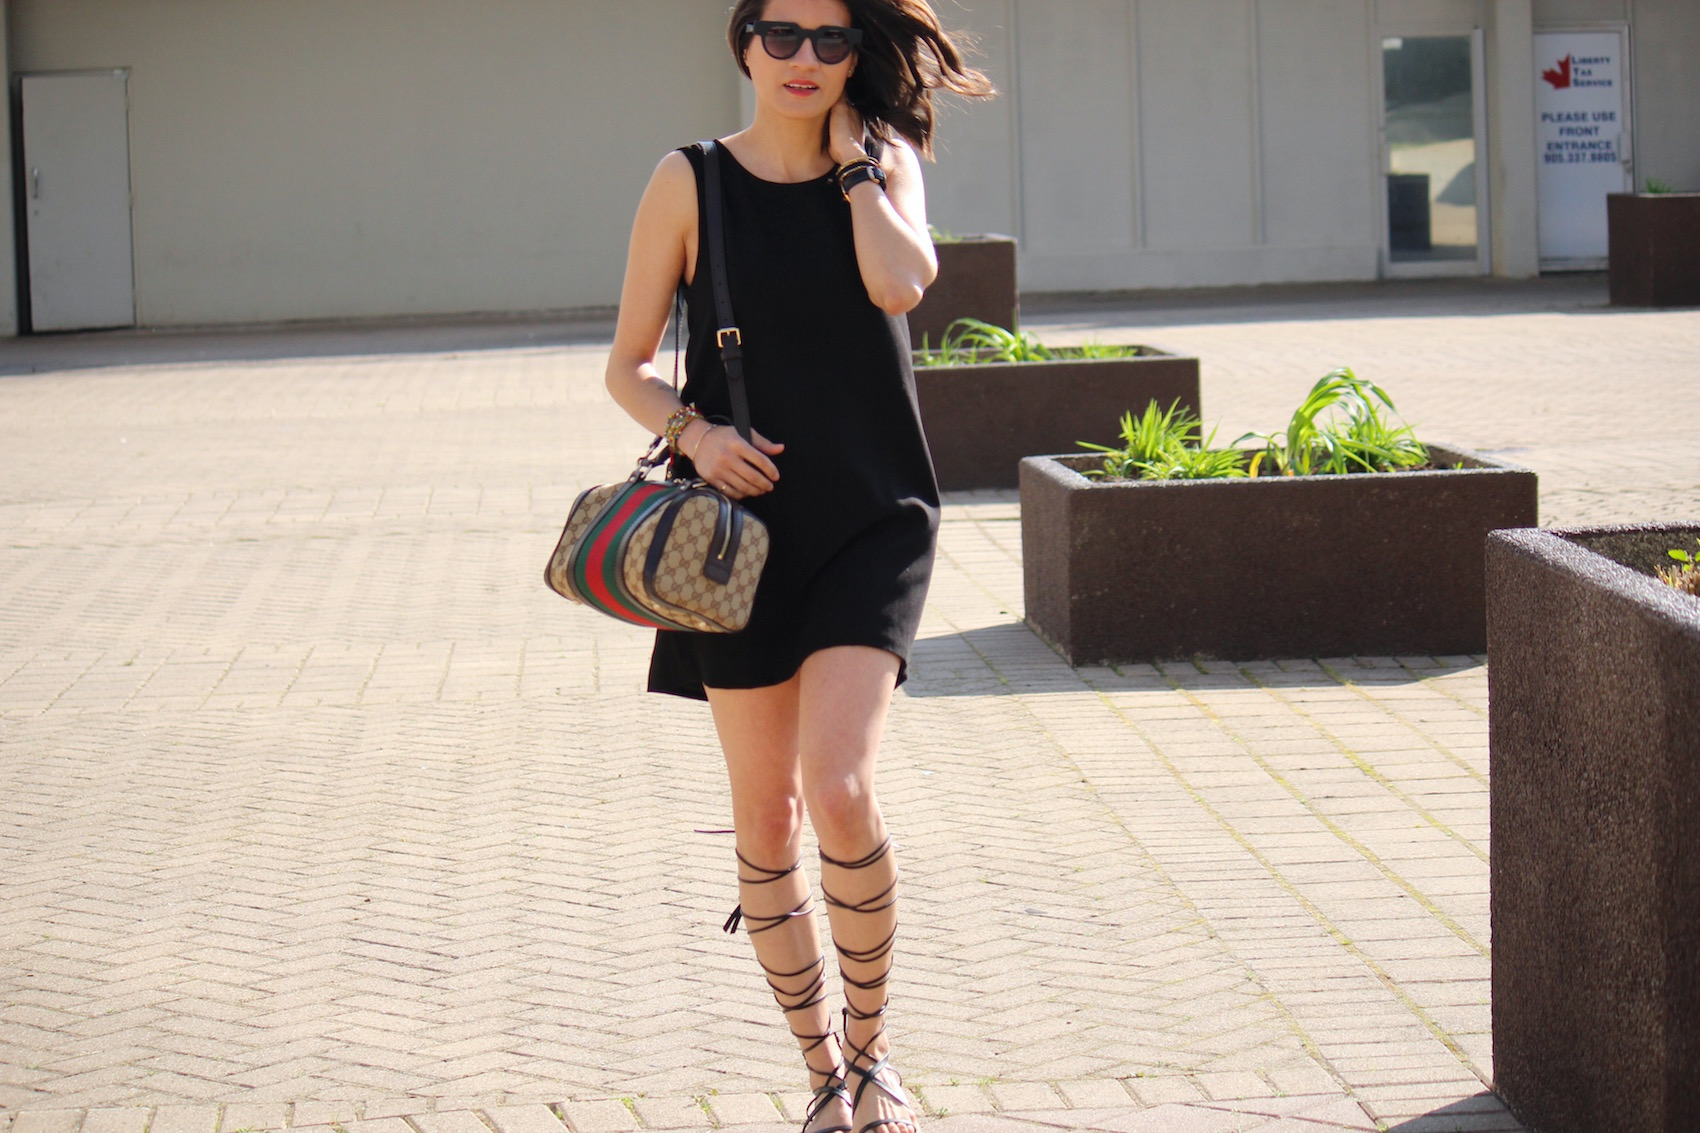 WoahStyle.com | How to Wear Black in the Summer_Black Mini Dress_Zara Gladiator Sandals_Gucci Boston Bag with Heritage Stripes_Street_Style_2874.jpg